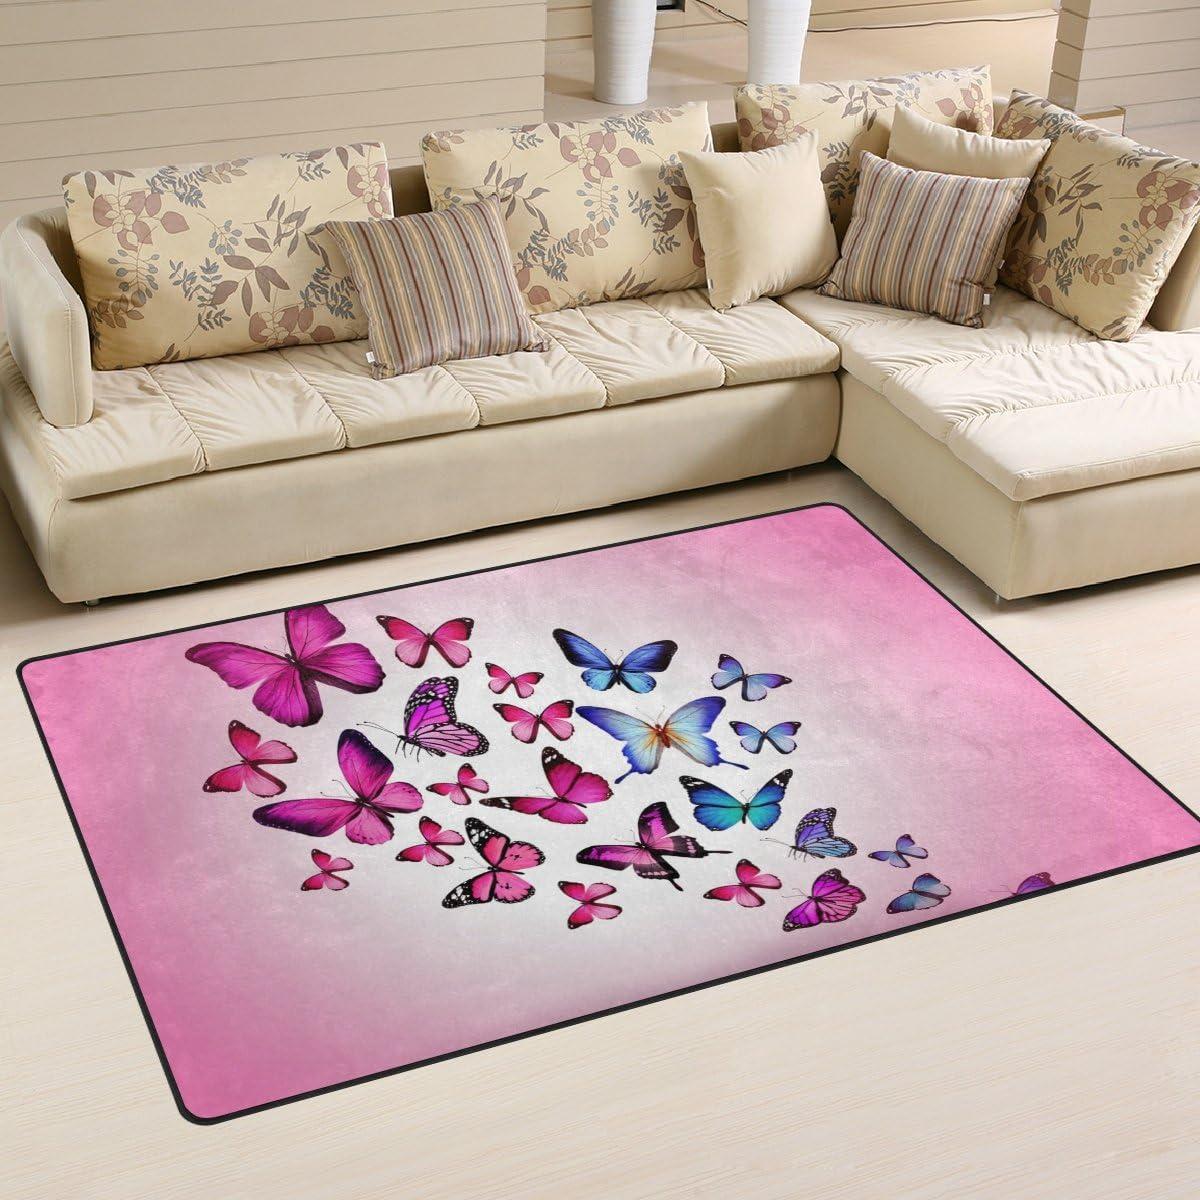 Butterfly Girl Living Room Floor Decor Mat Yoga Carpet Kids Crawling Area Rugs